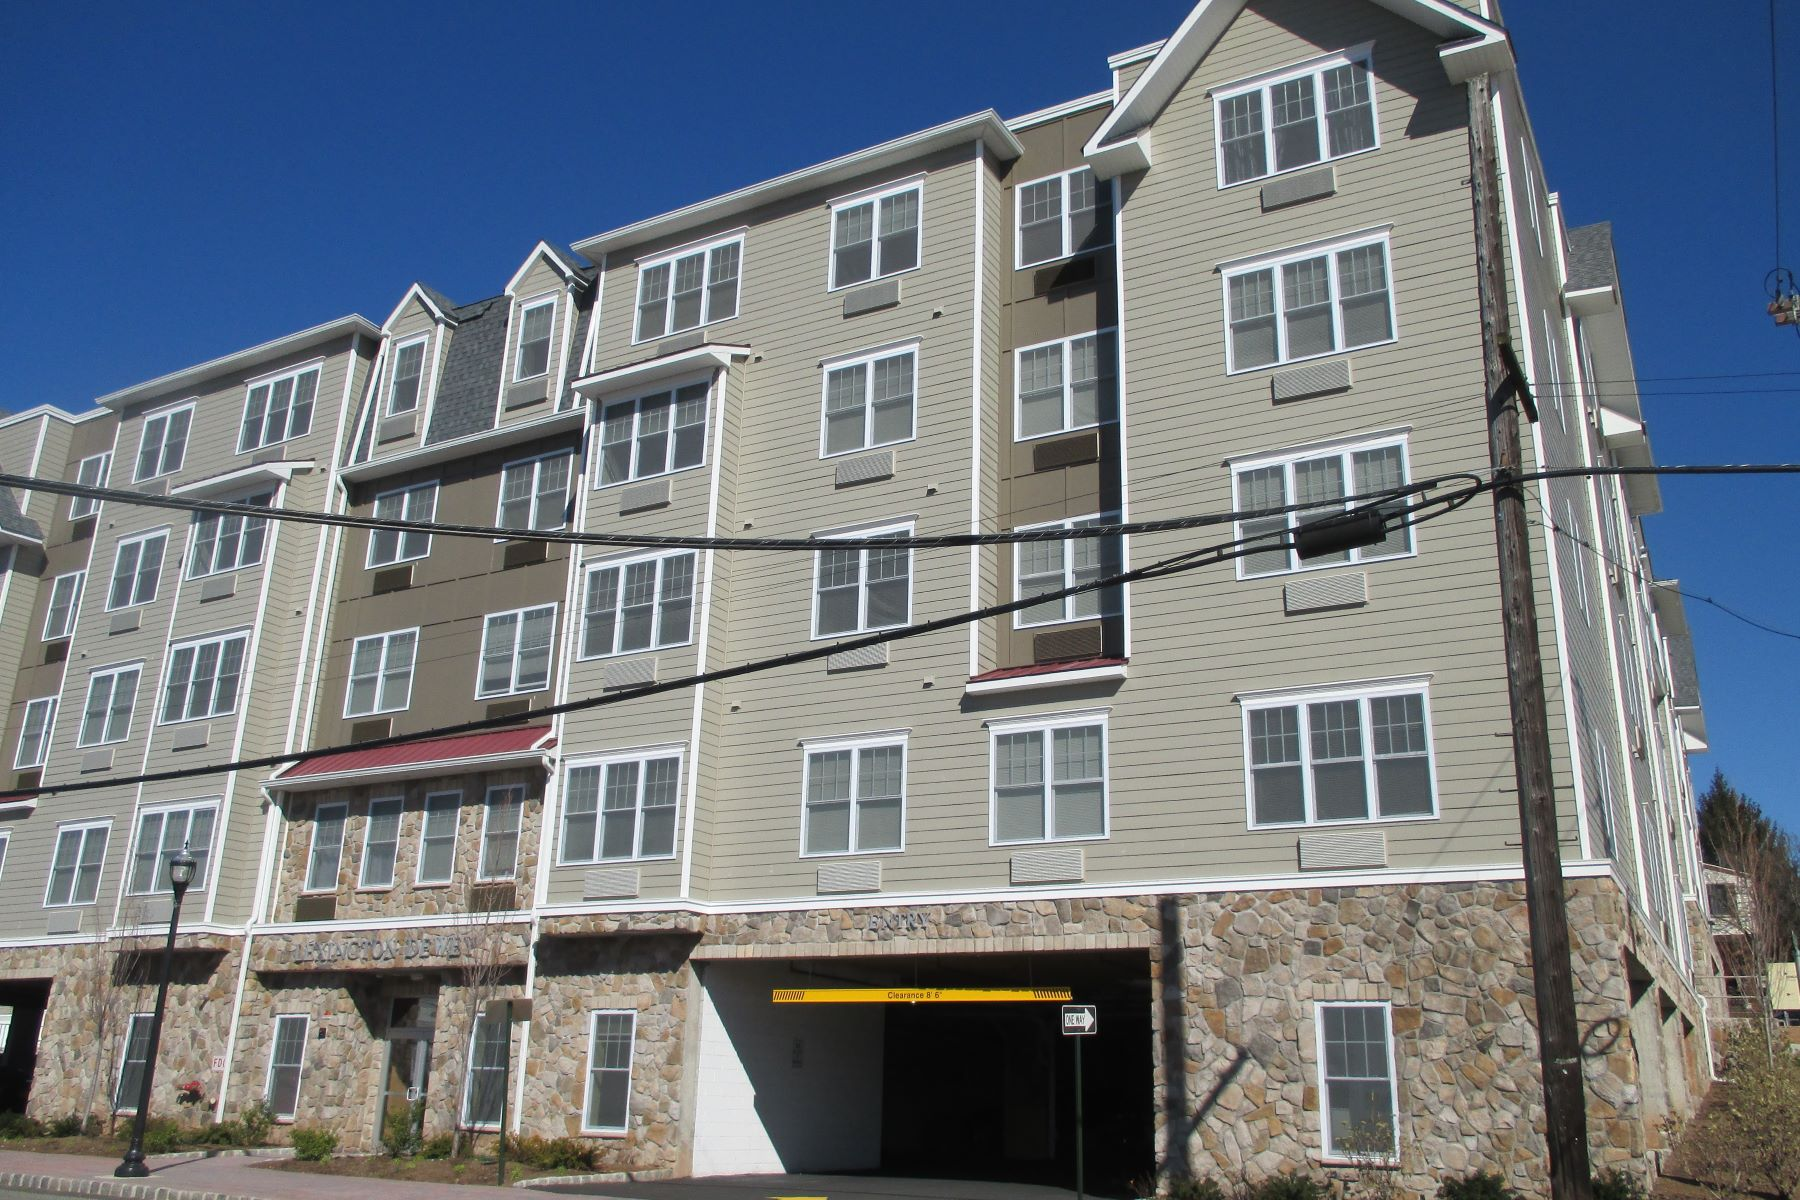 شقة للـ Rent في Lexington Dewey 297 Palisade Ave. #506-F, Bogota, New Jersey, 07603 United States